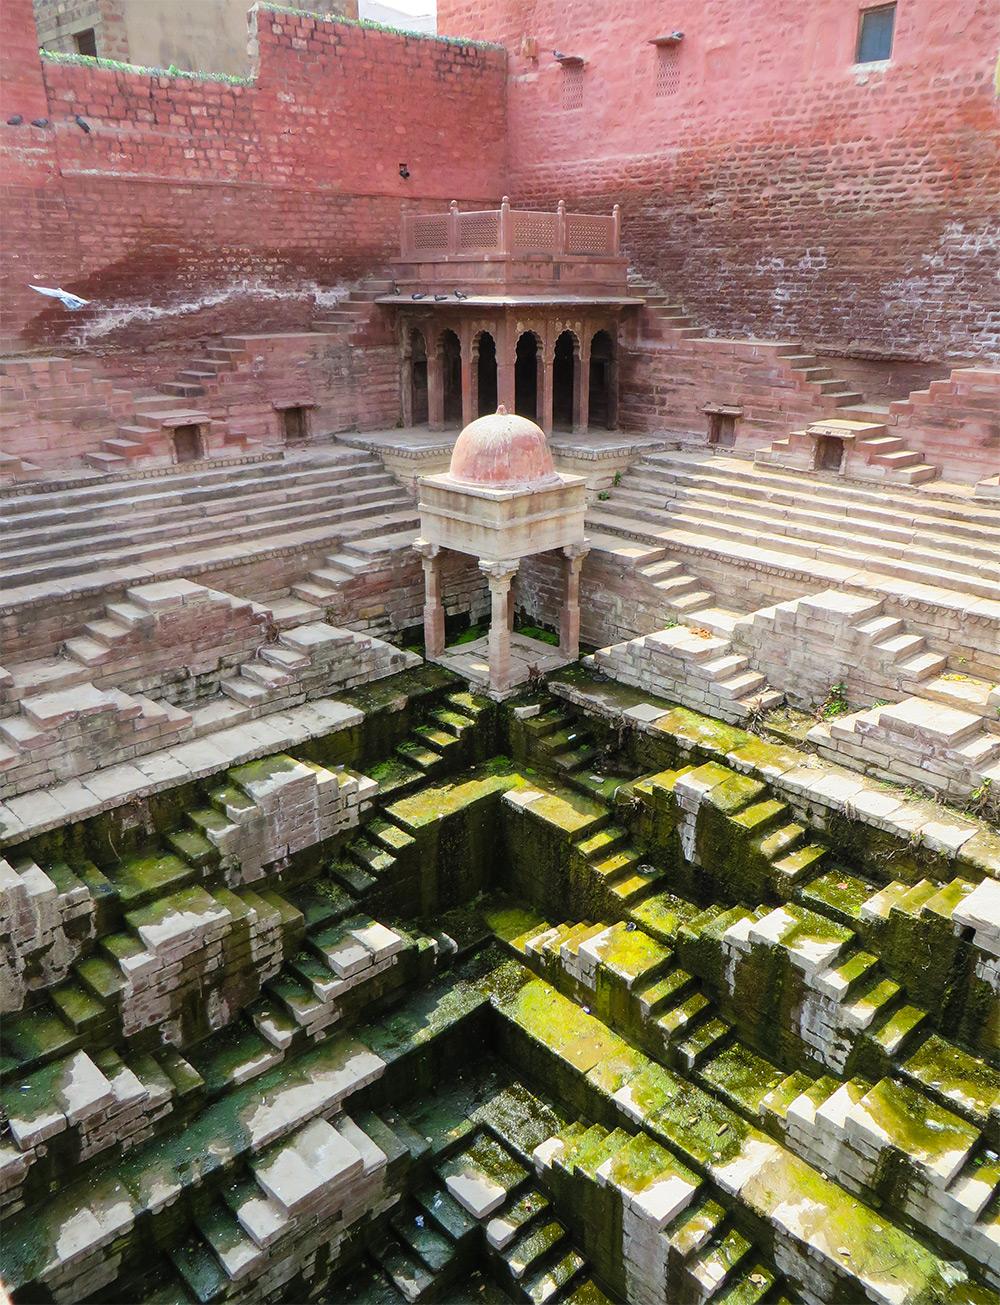 arquitetura-que-esta-desaparecendo-na-india-victoria-blog-usenatureza